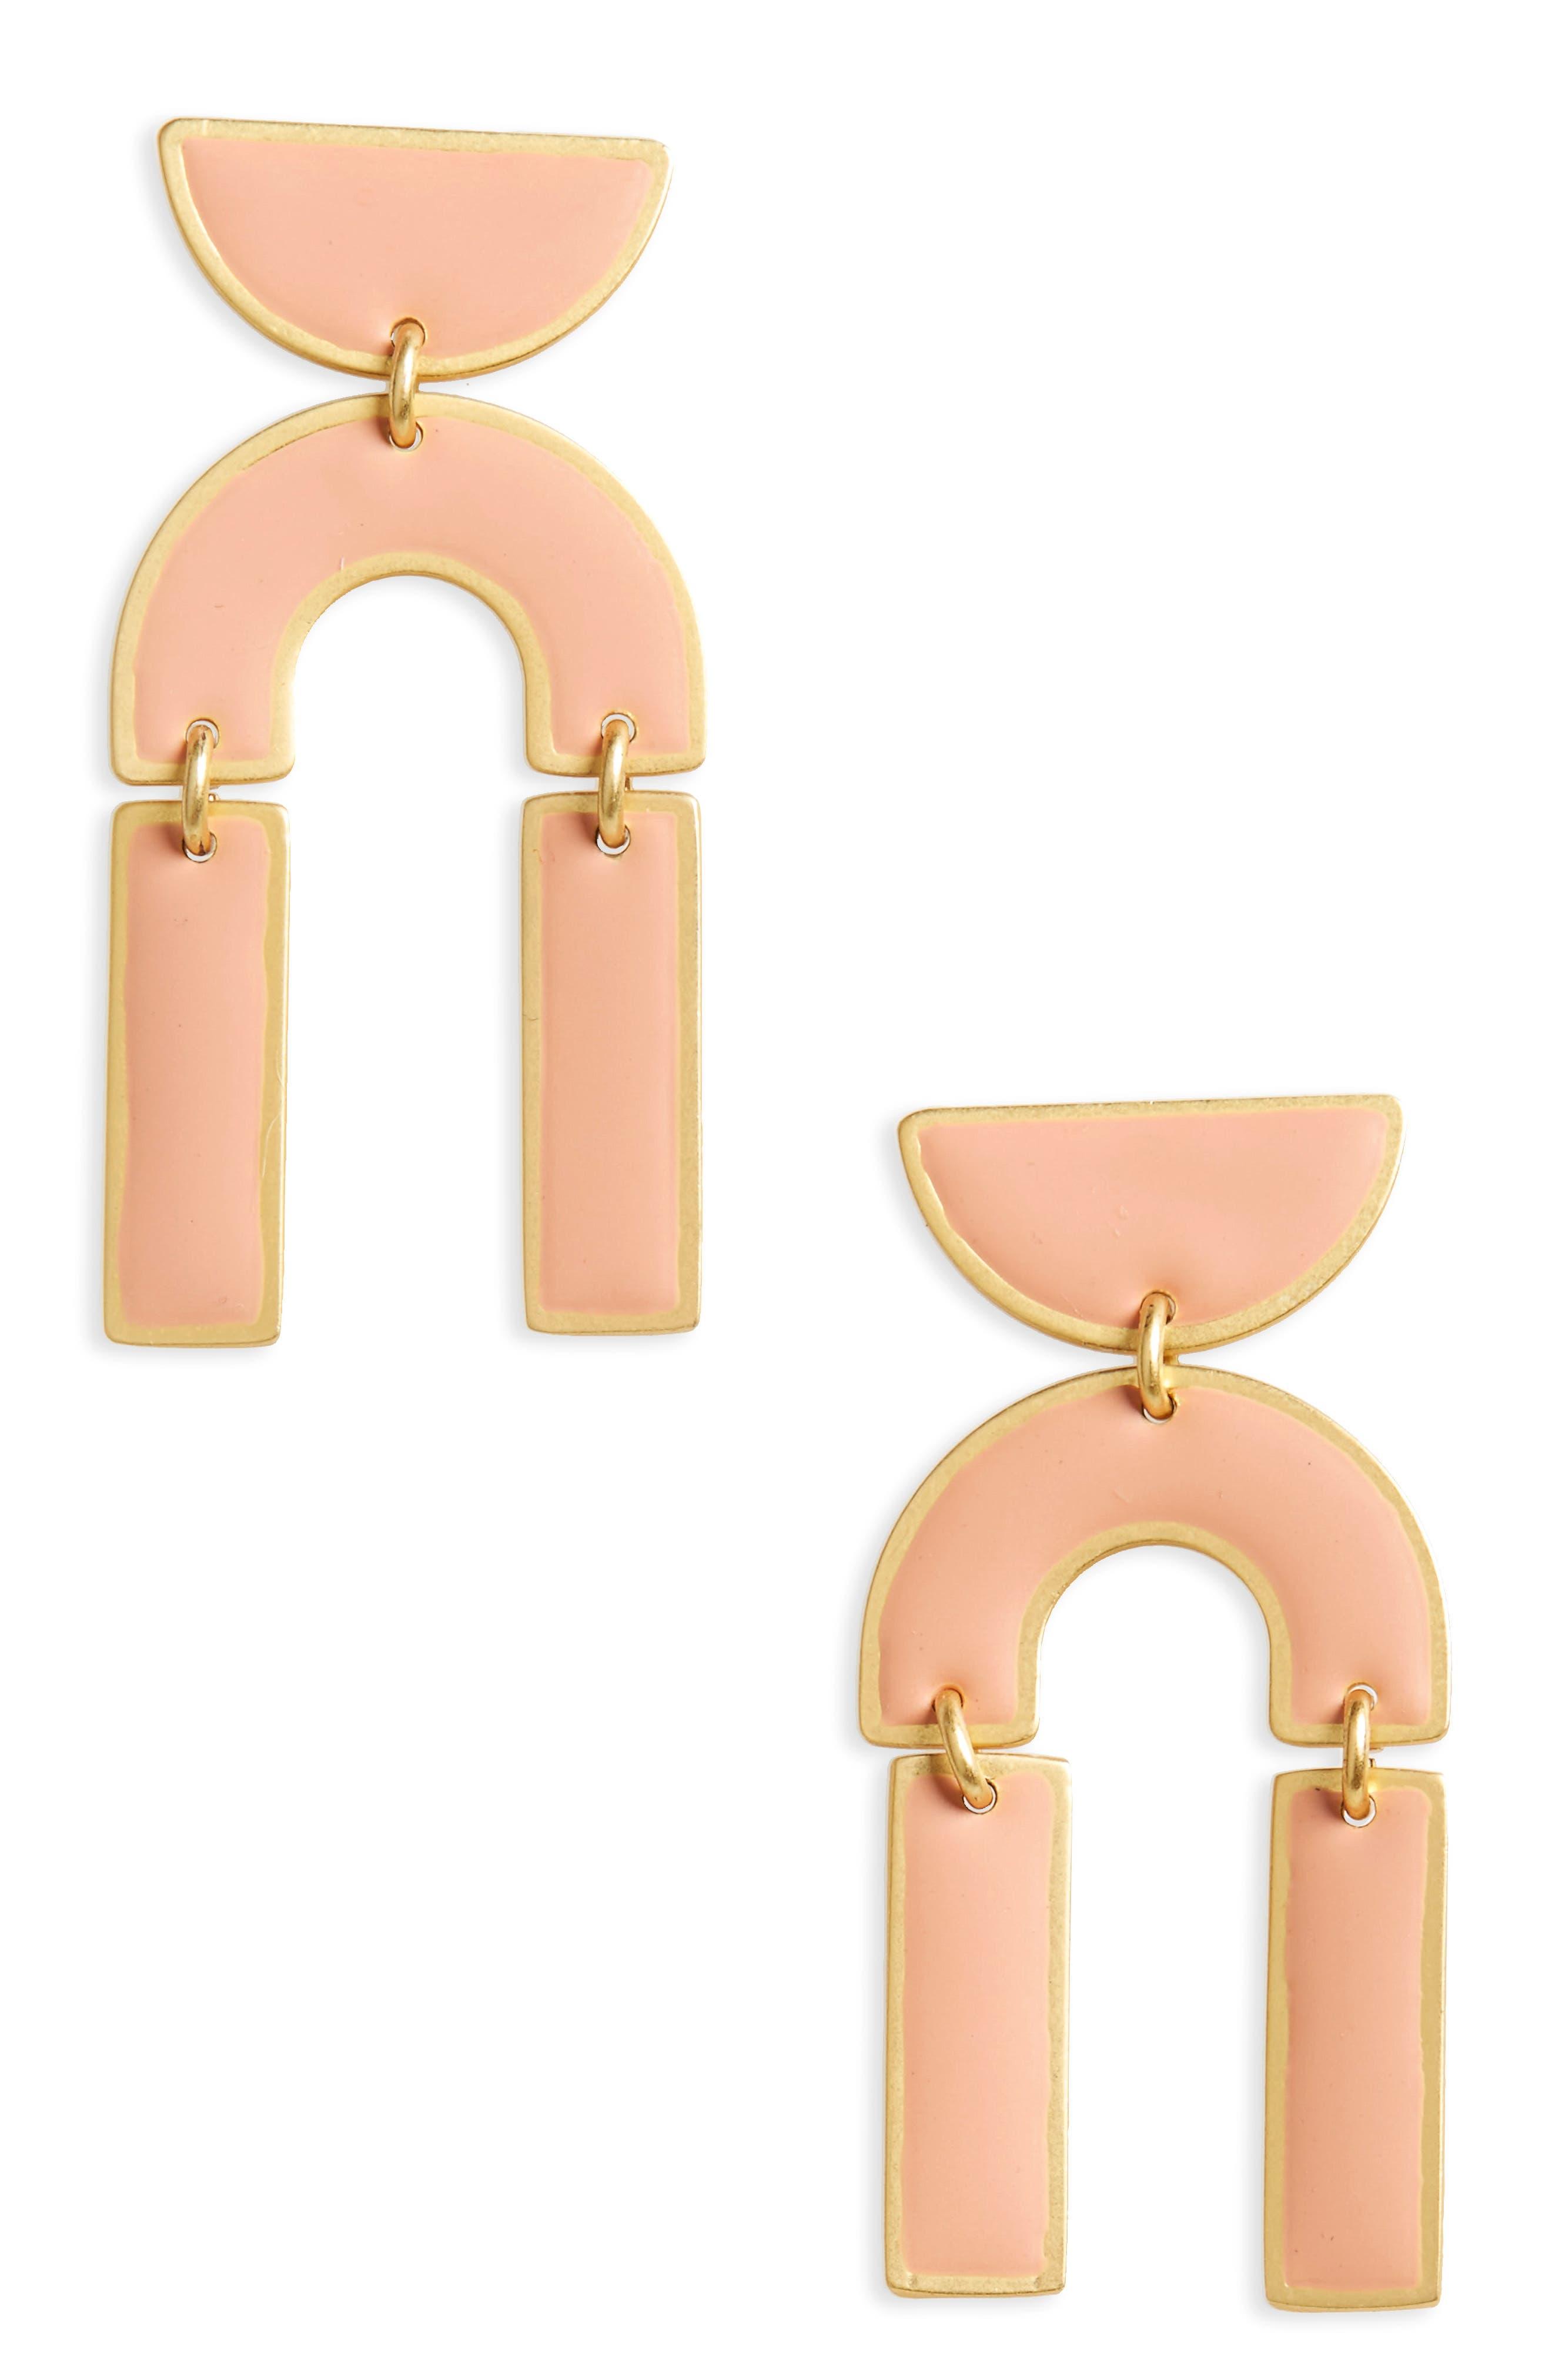 Modernism Half-Drop Earrings,                             Main thumbnail 1, color,                             710